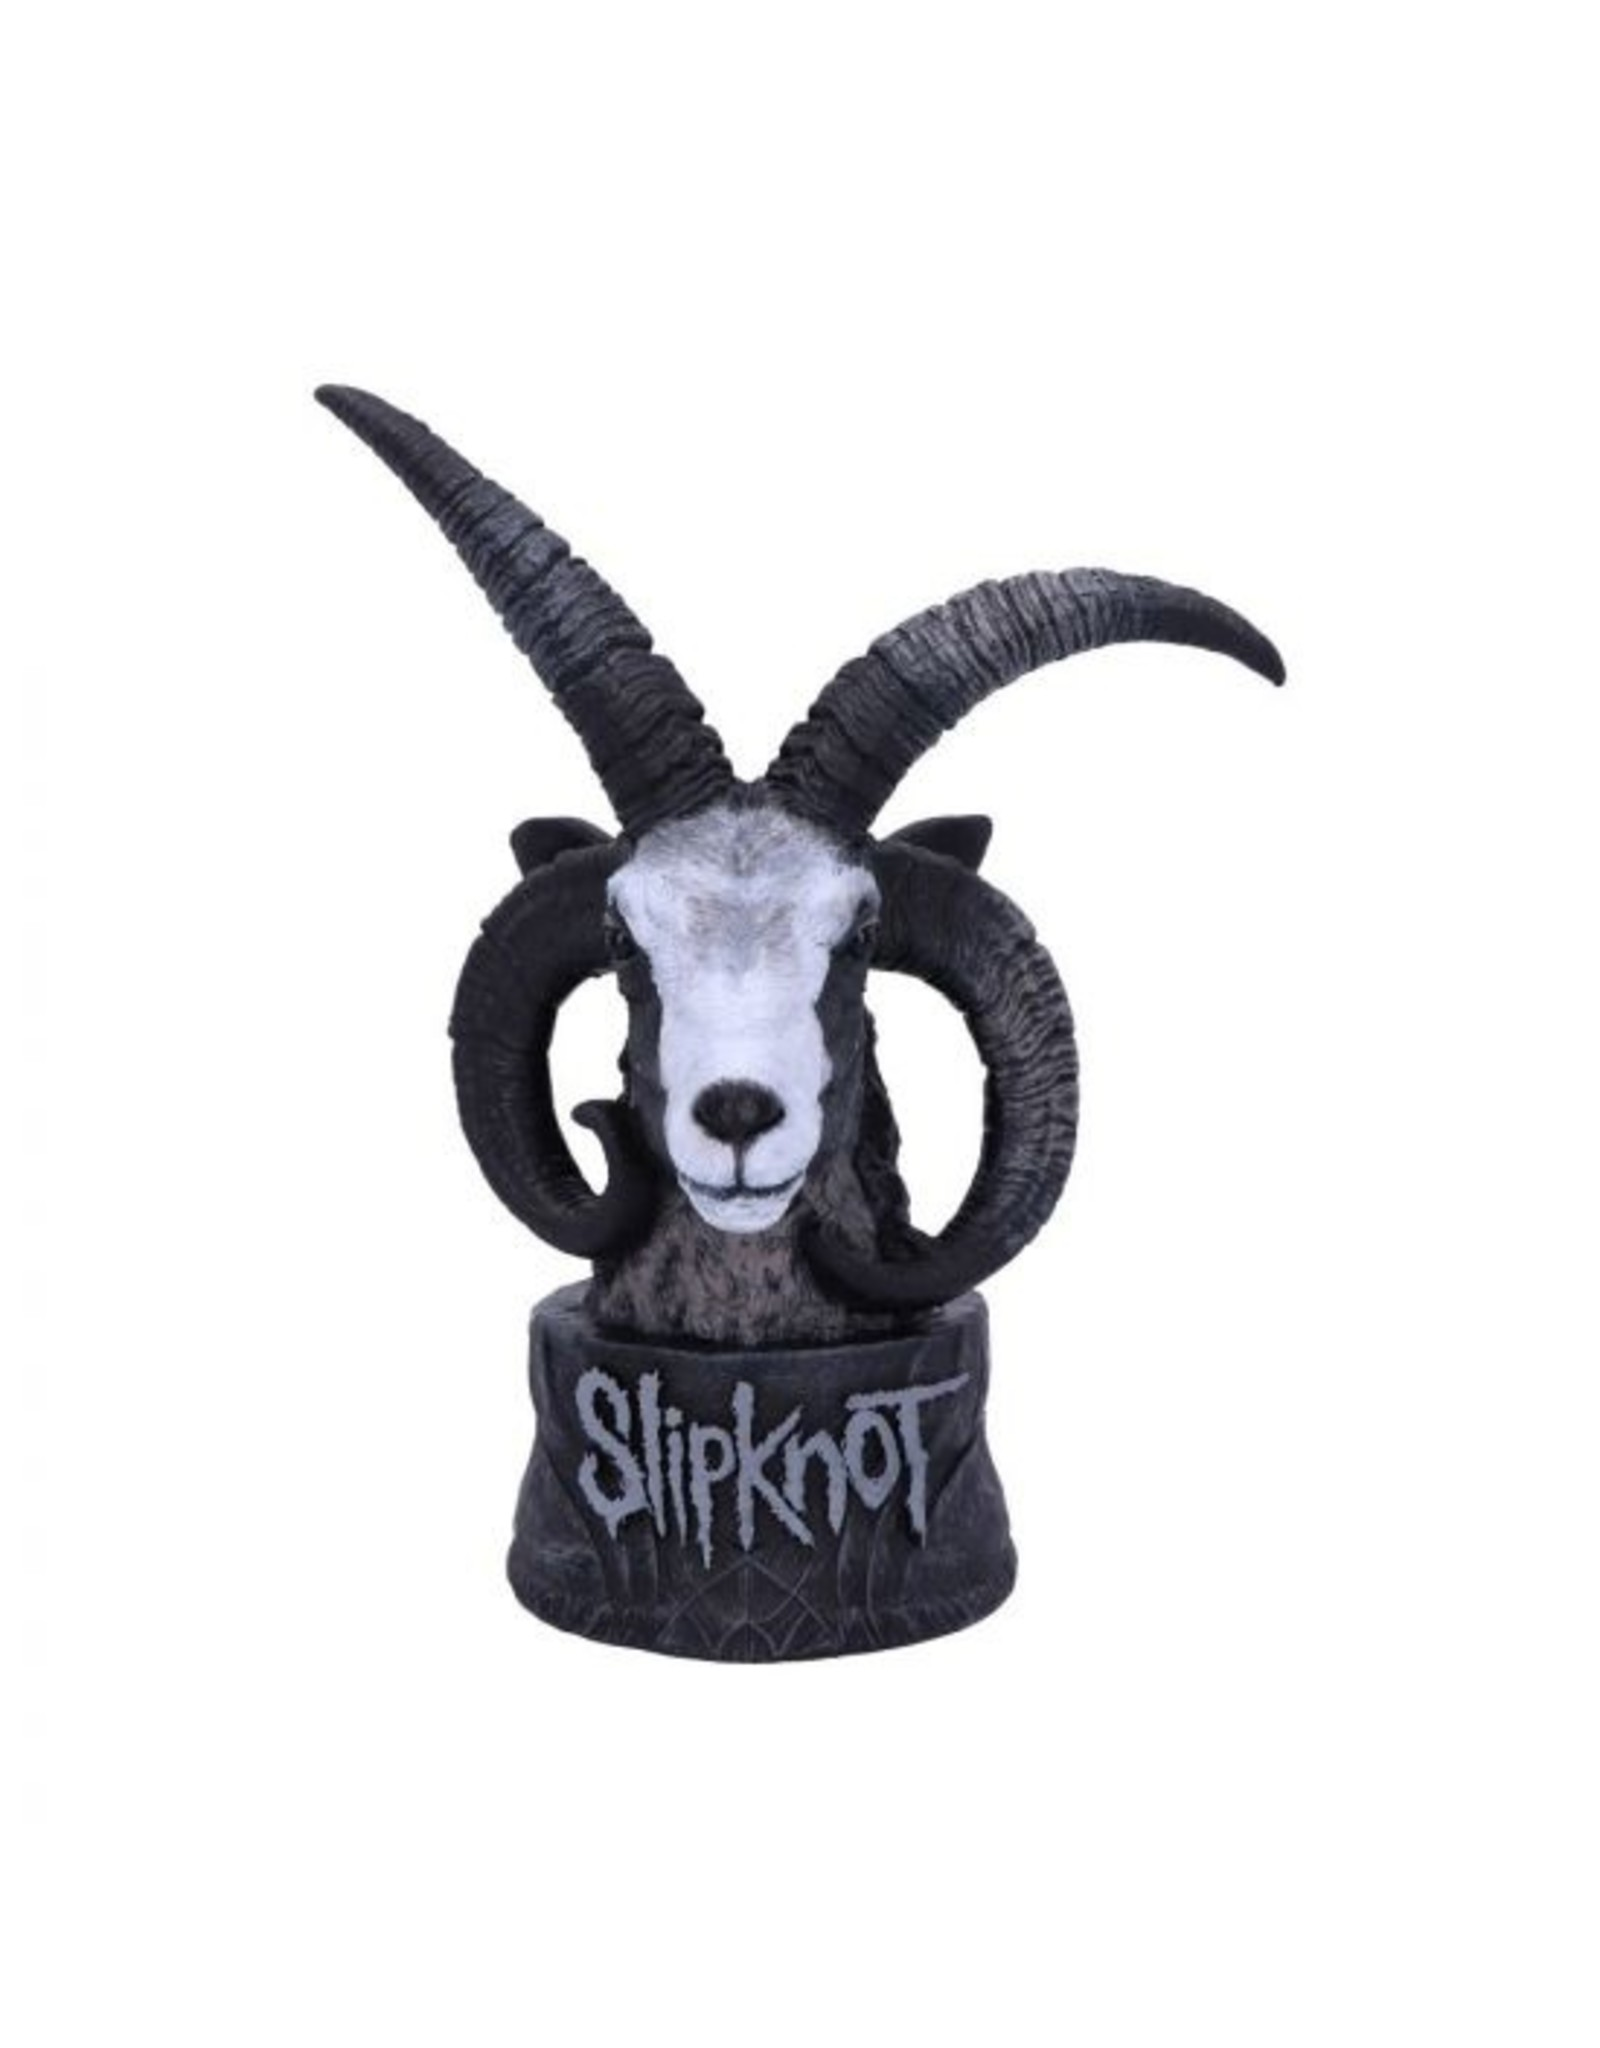 Slipknot Slipknot Figur - Ziegenkopf Flaming Goat 23 cm